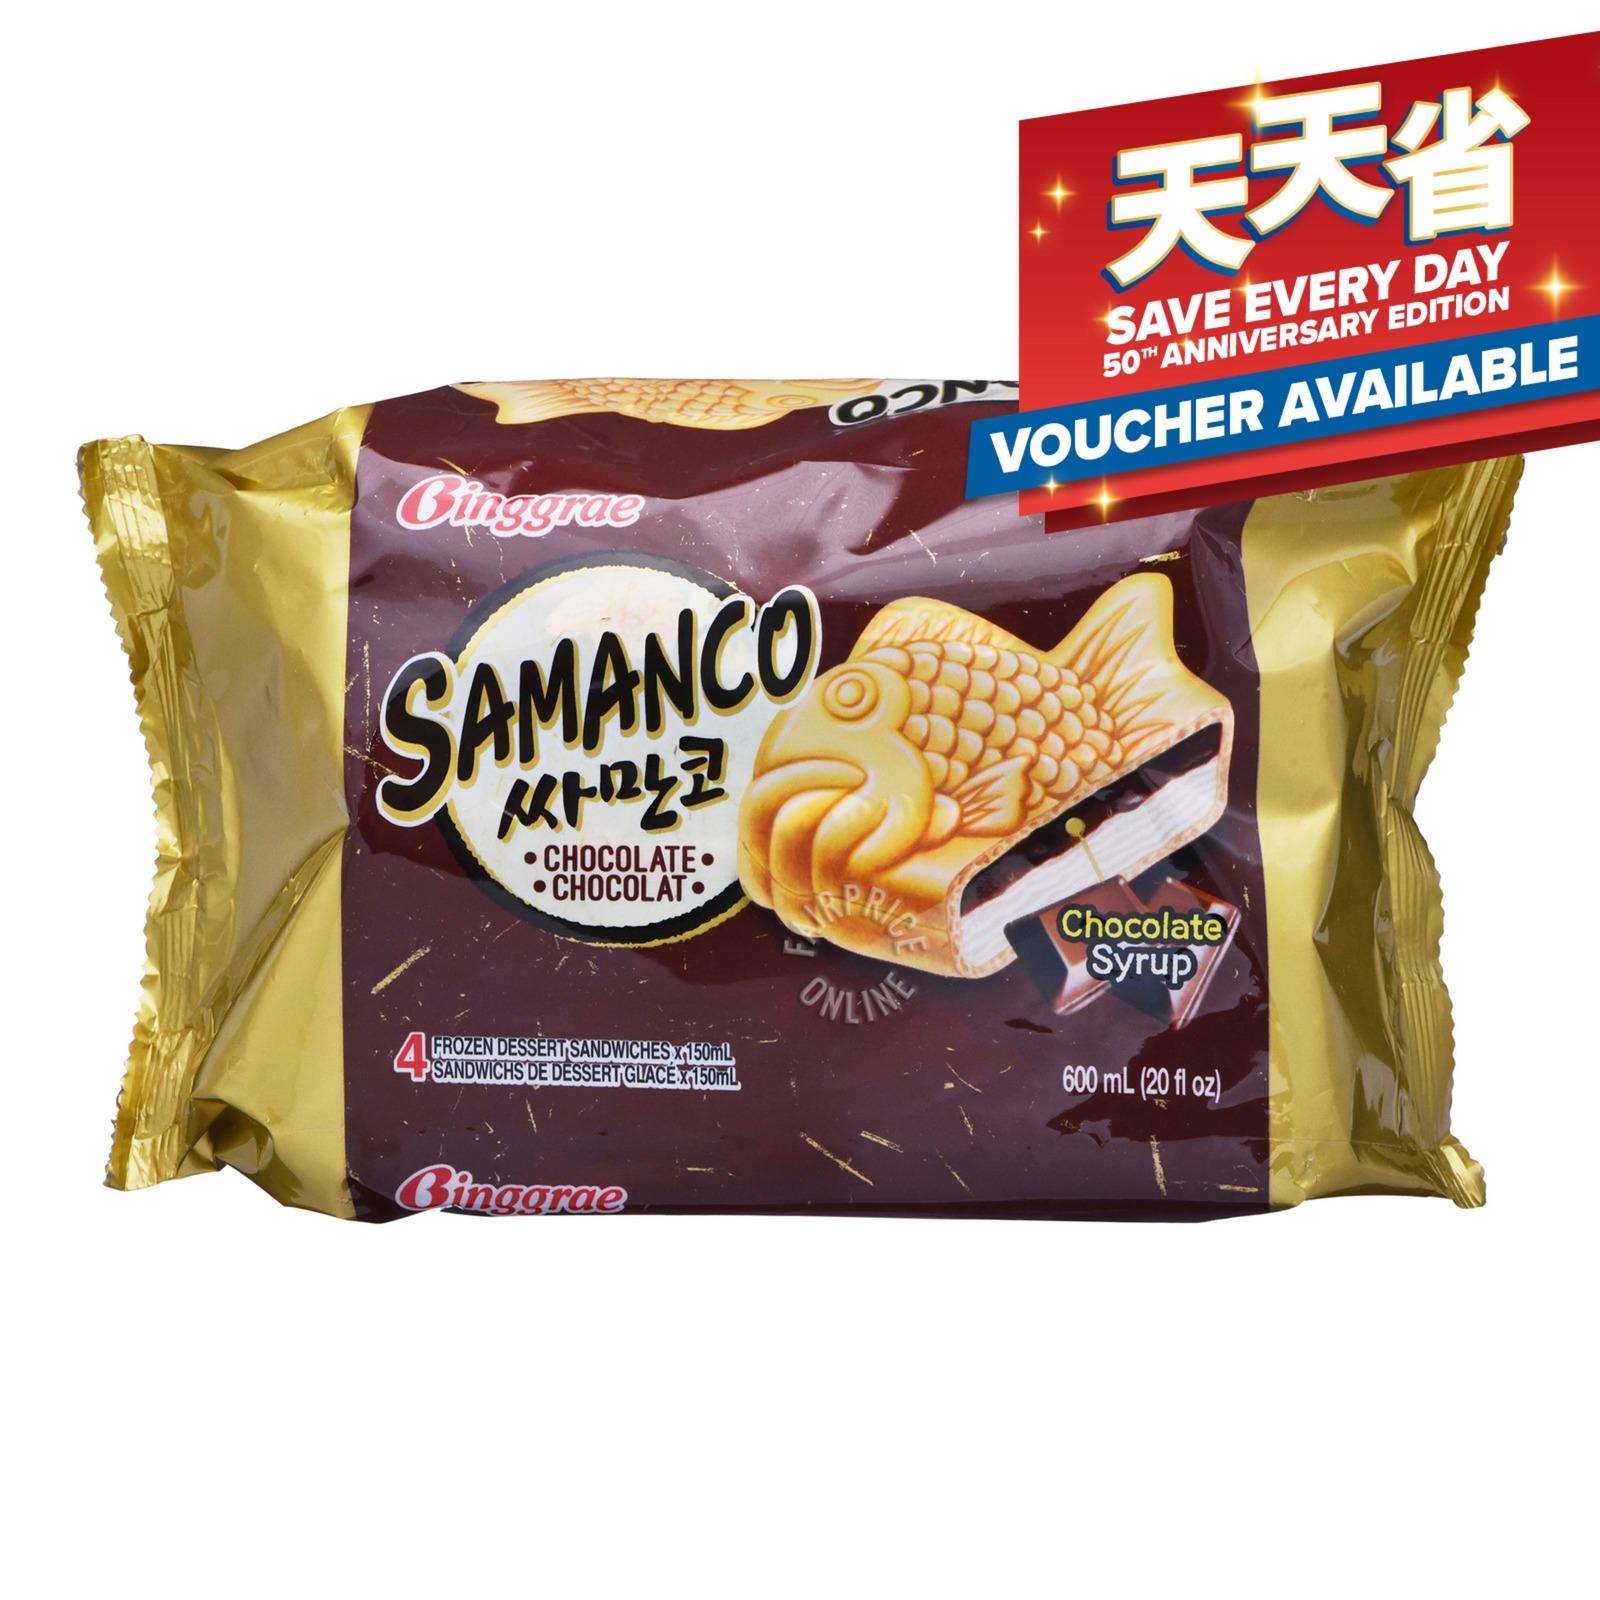 Binggrae Samanco Ice Cream Sandwich - Chocolate